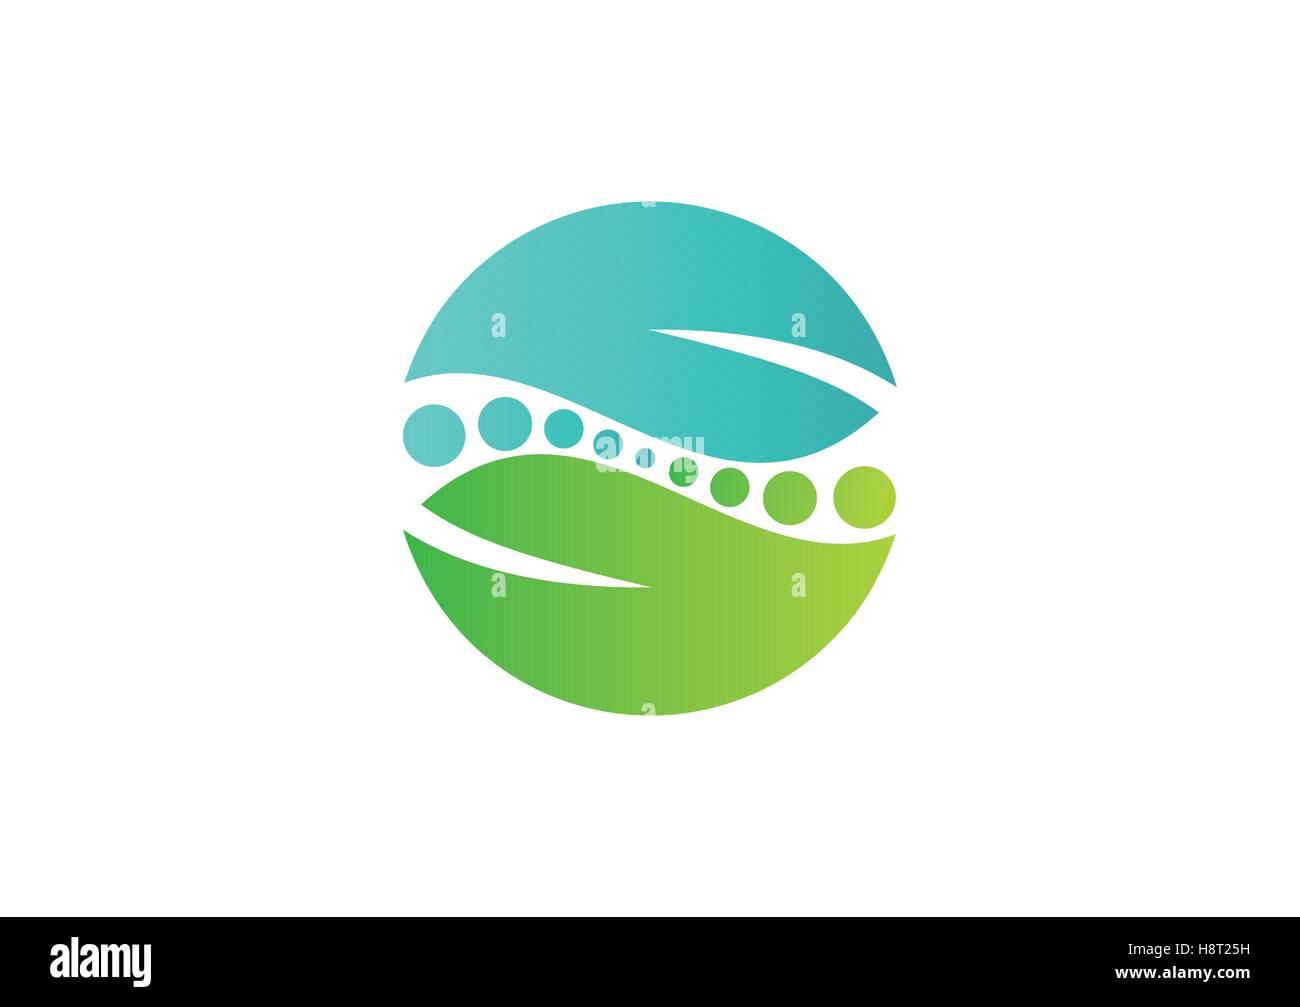 circle leaves ideas logo, ecology symbol, spa icon vector design template, global spine natural balance design - Stock Vector